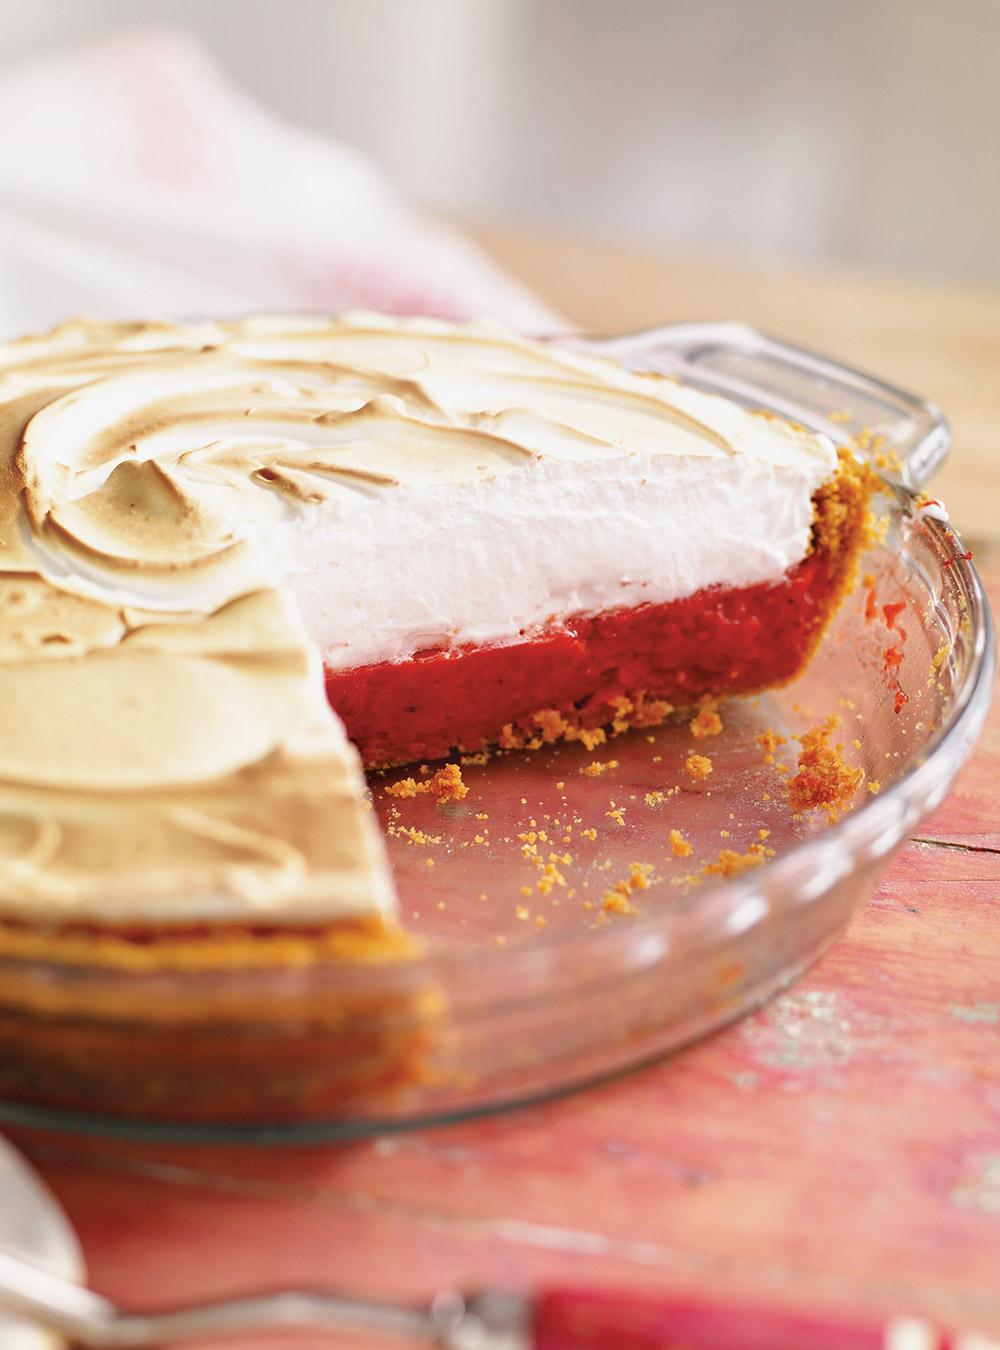 Tarte aux fraises meringuée | ricardo